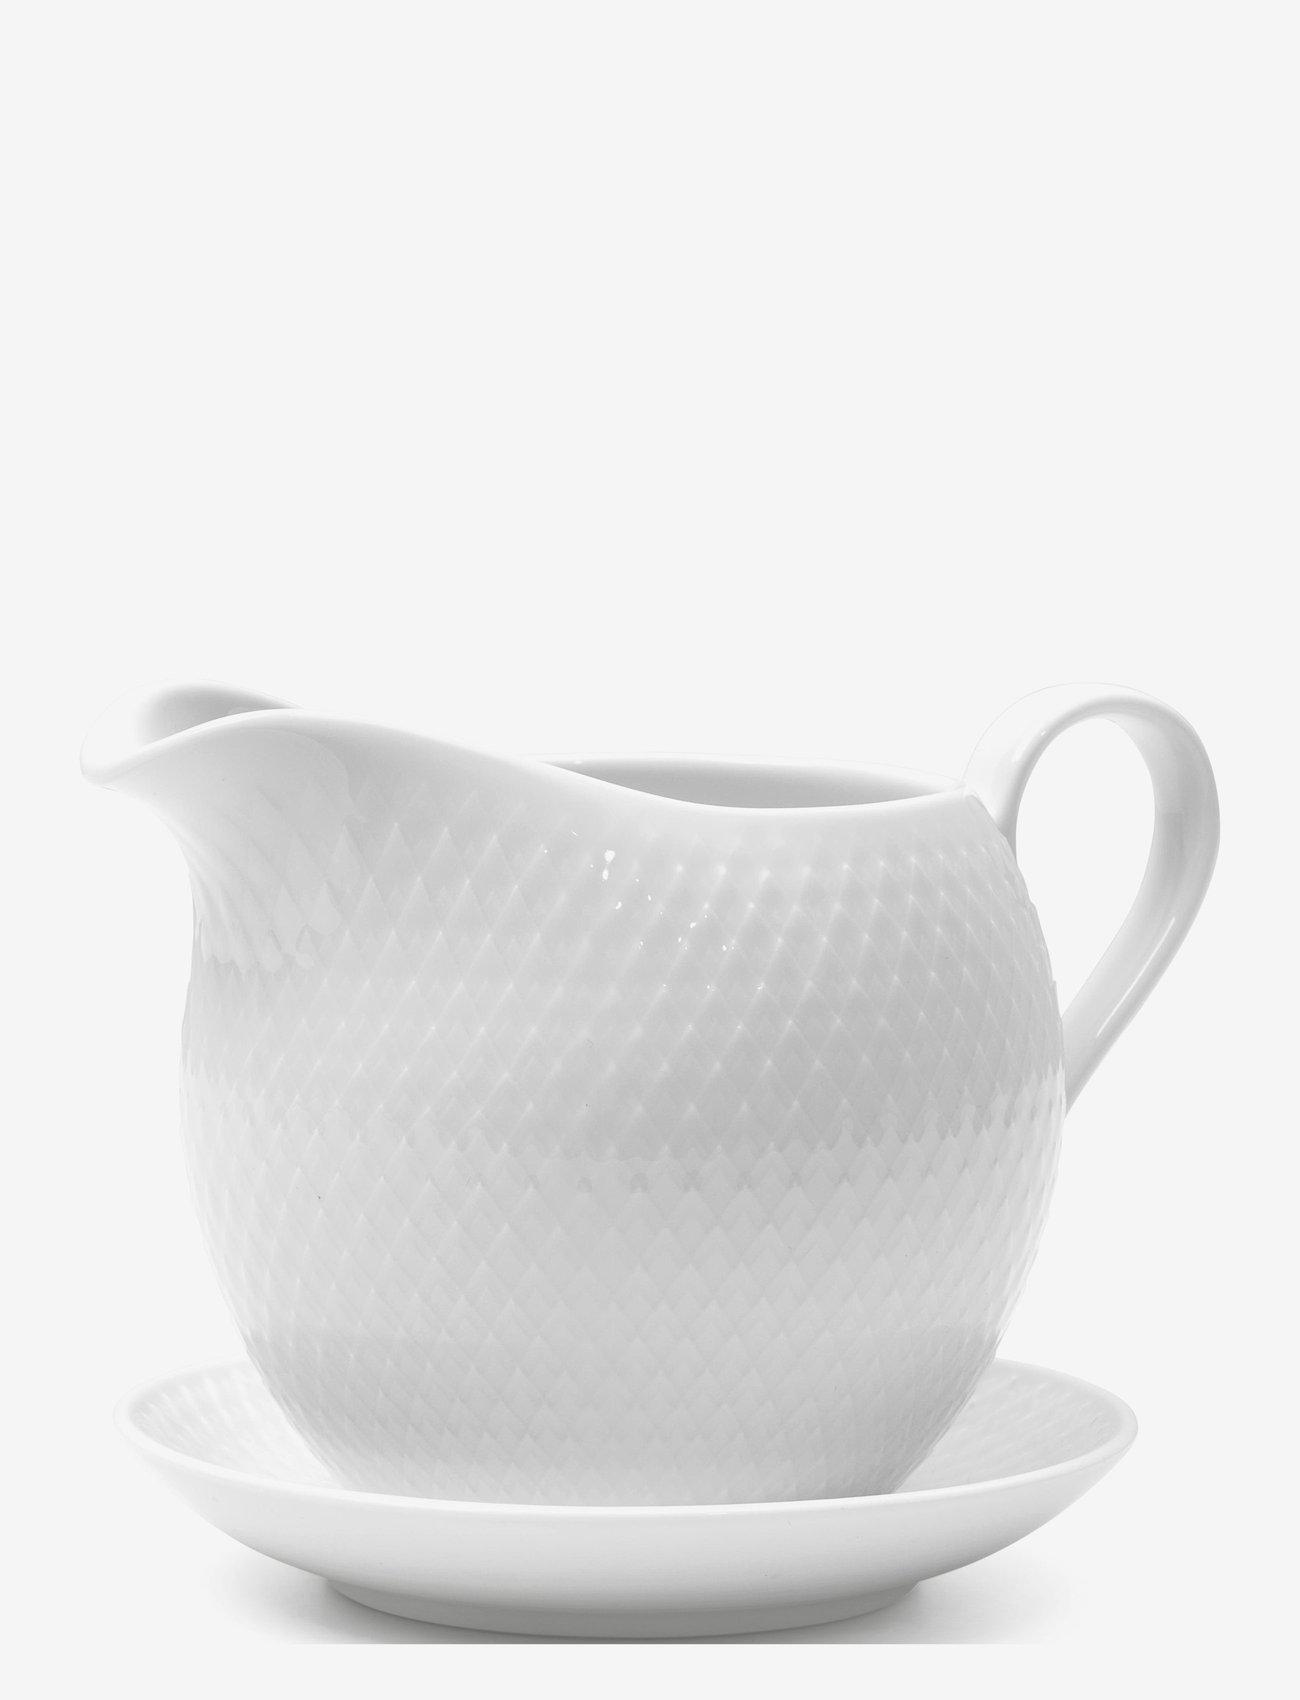 Lyngby Porcelæn - Rhombe Sausekanne 67 cl - sausenebb og sausekanner - white - 1